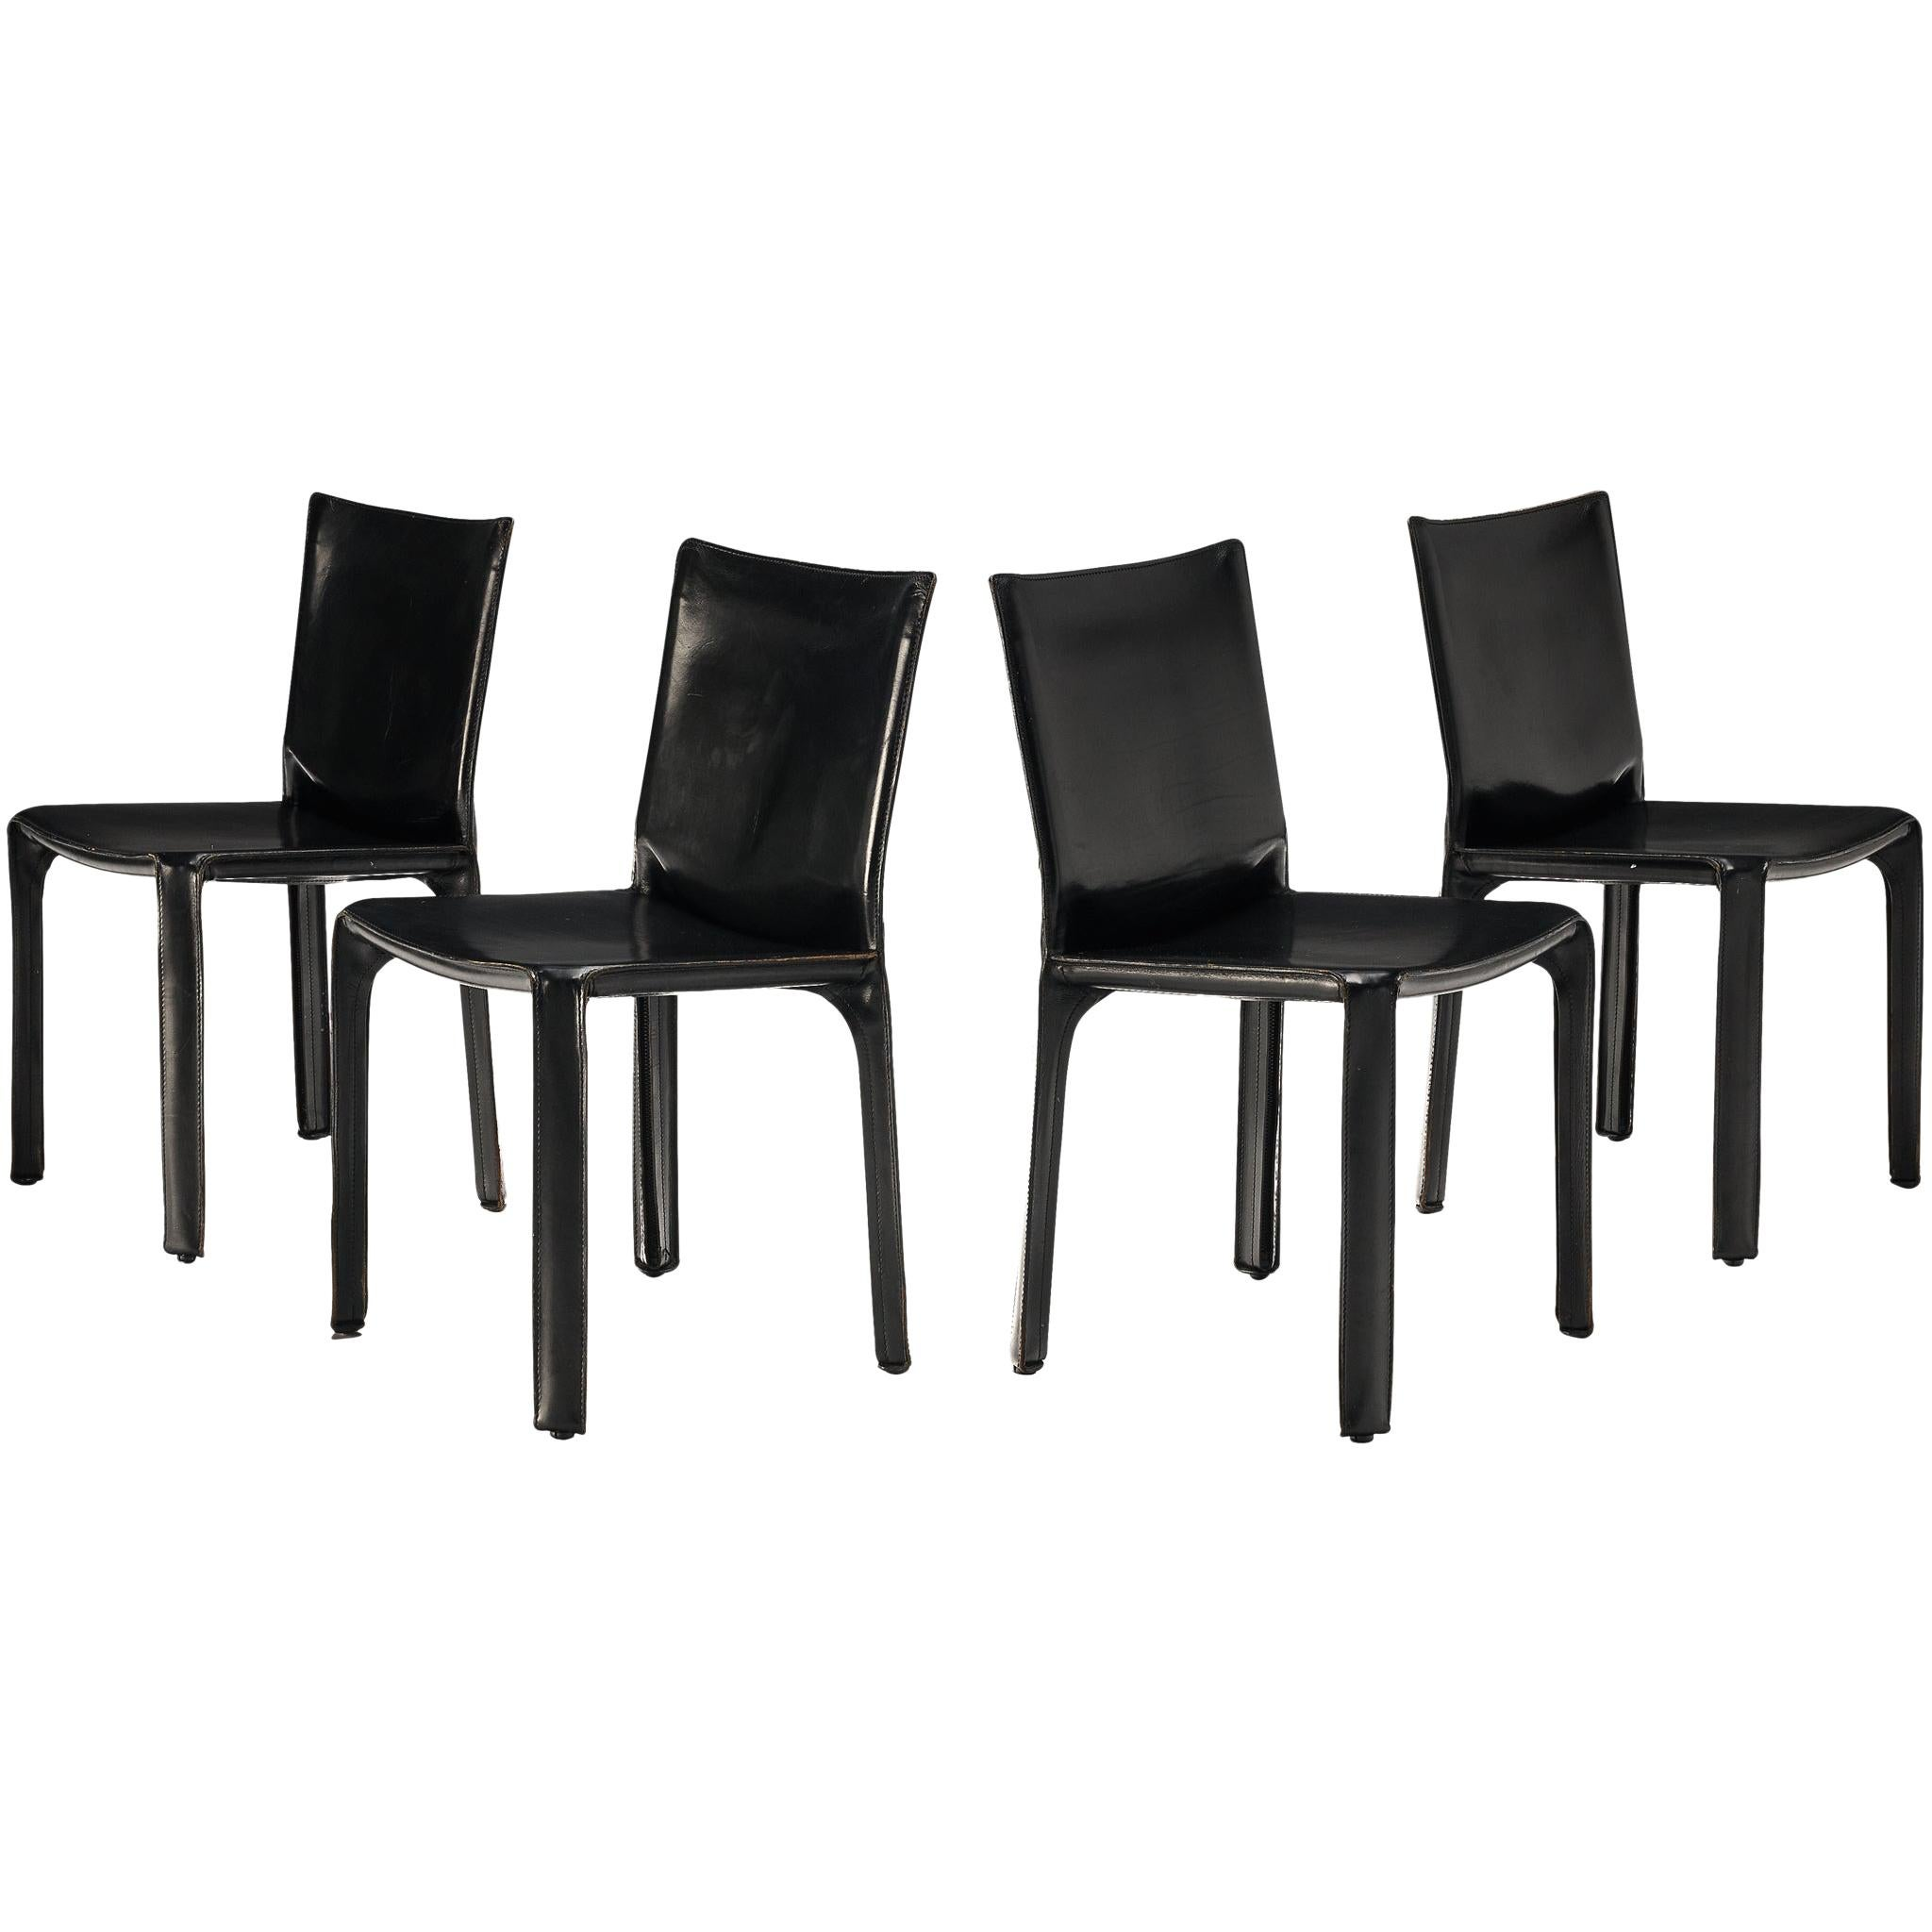 Mario Bellini Set of Four Black 'Cab' Dining Chairs